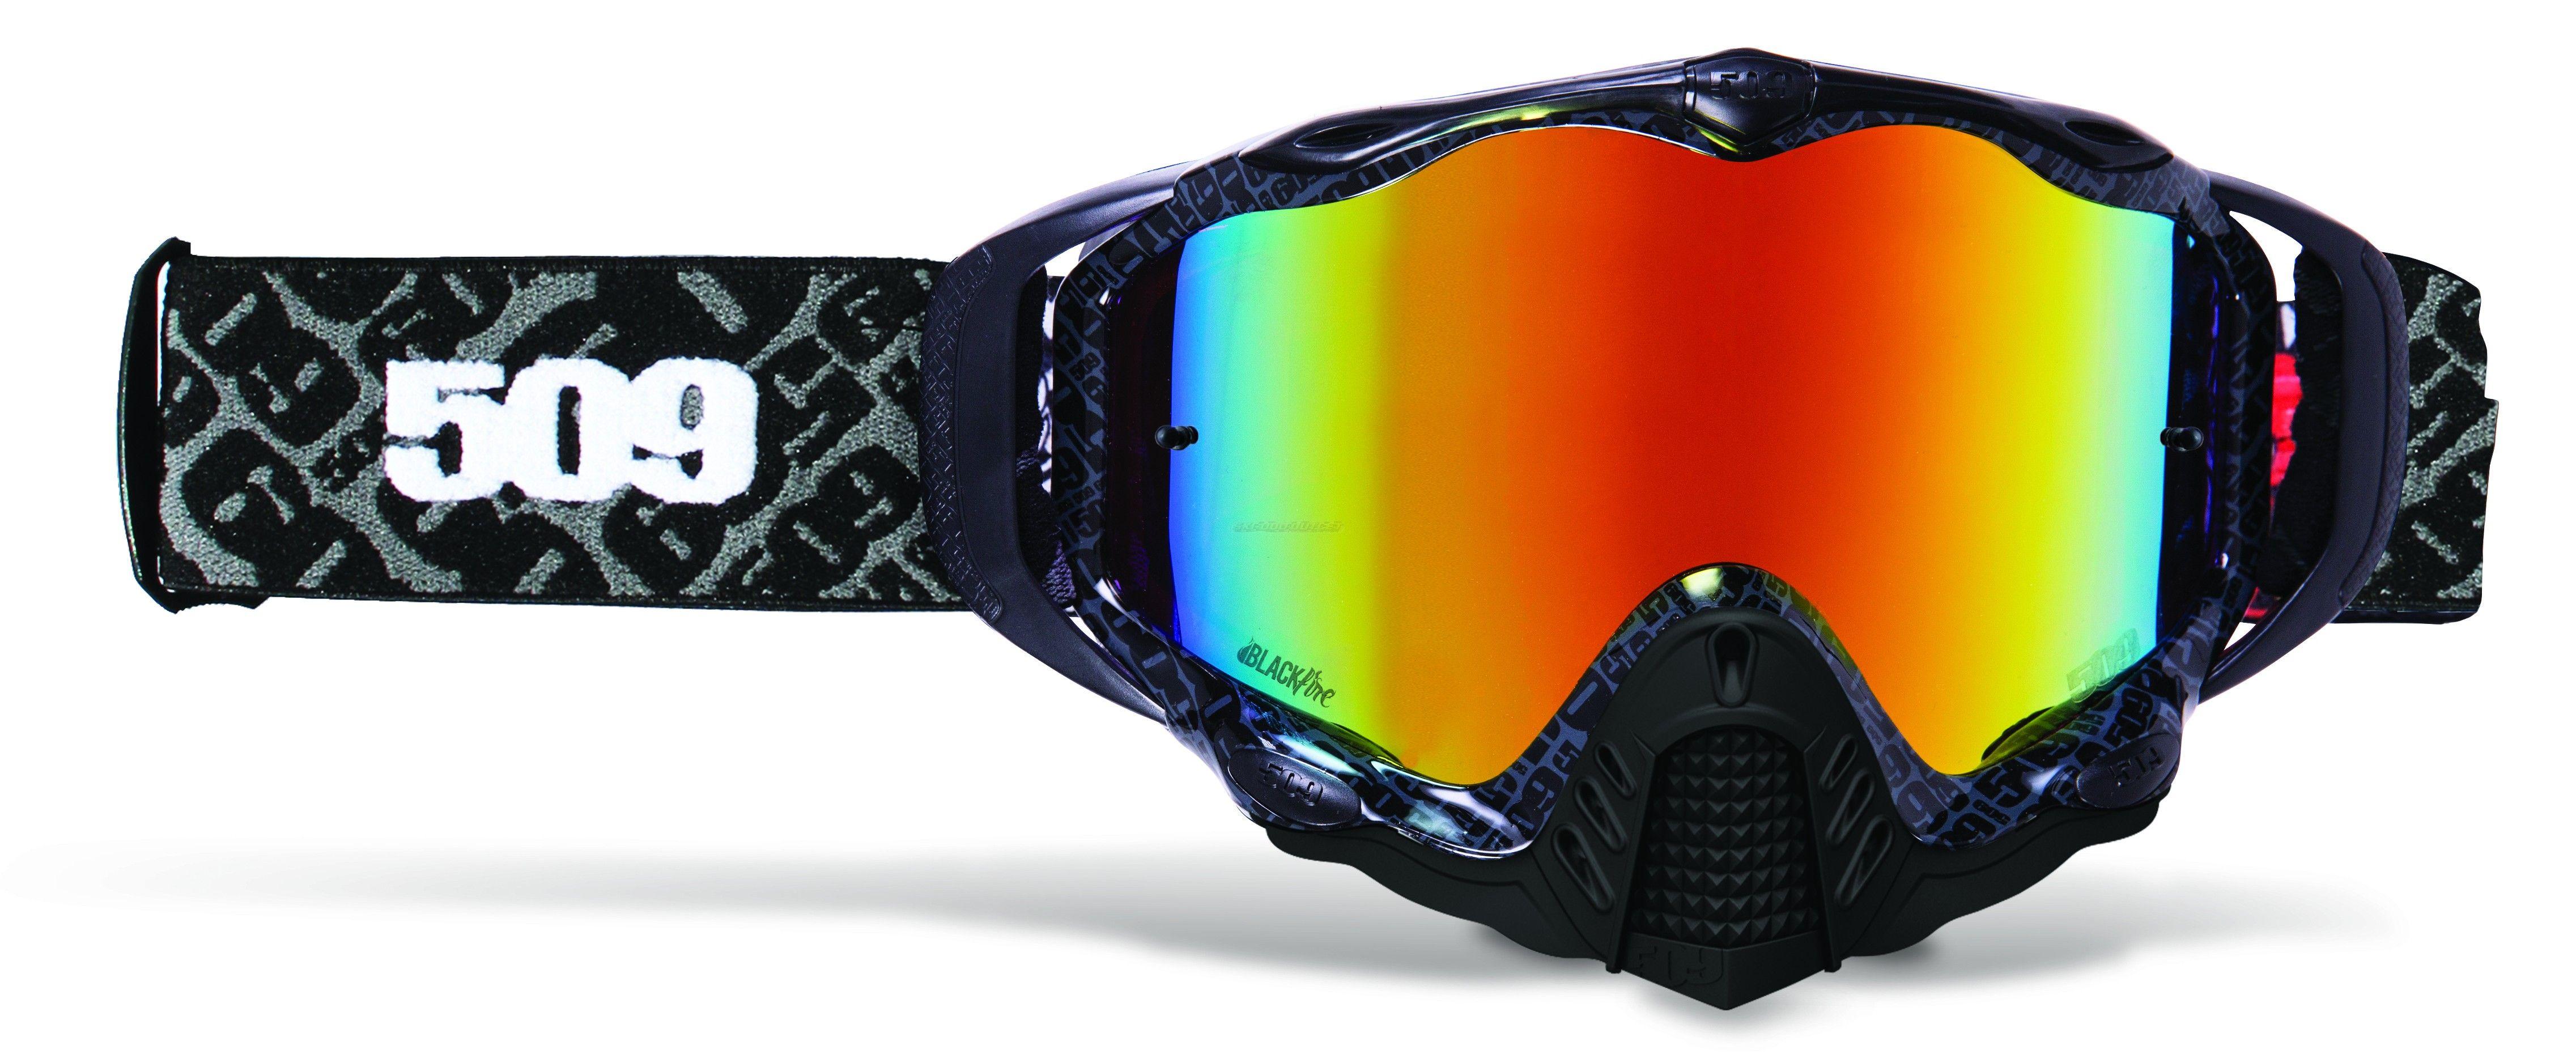 1eb4a41dbd60 509 Sinister MX-5 Black Fire MX OffRoad Snowmobile Goggles